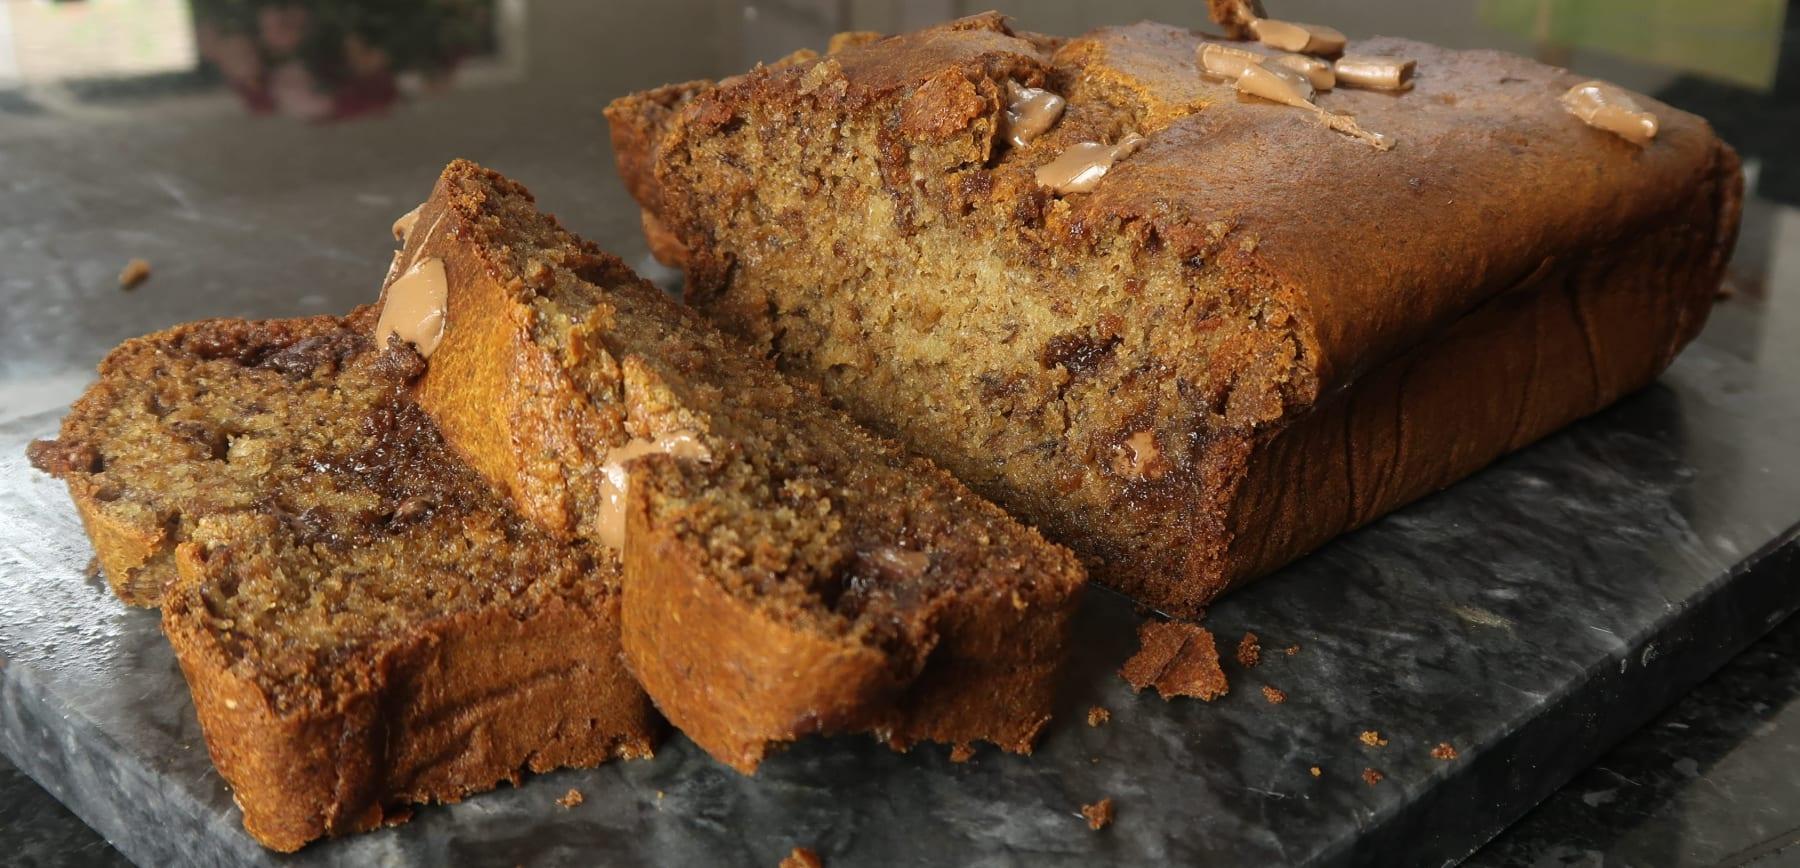 Banana bread snízkým obsahem cukru – lahodný a jednoduchý recept